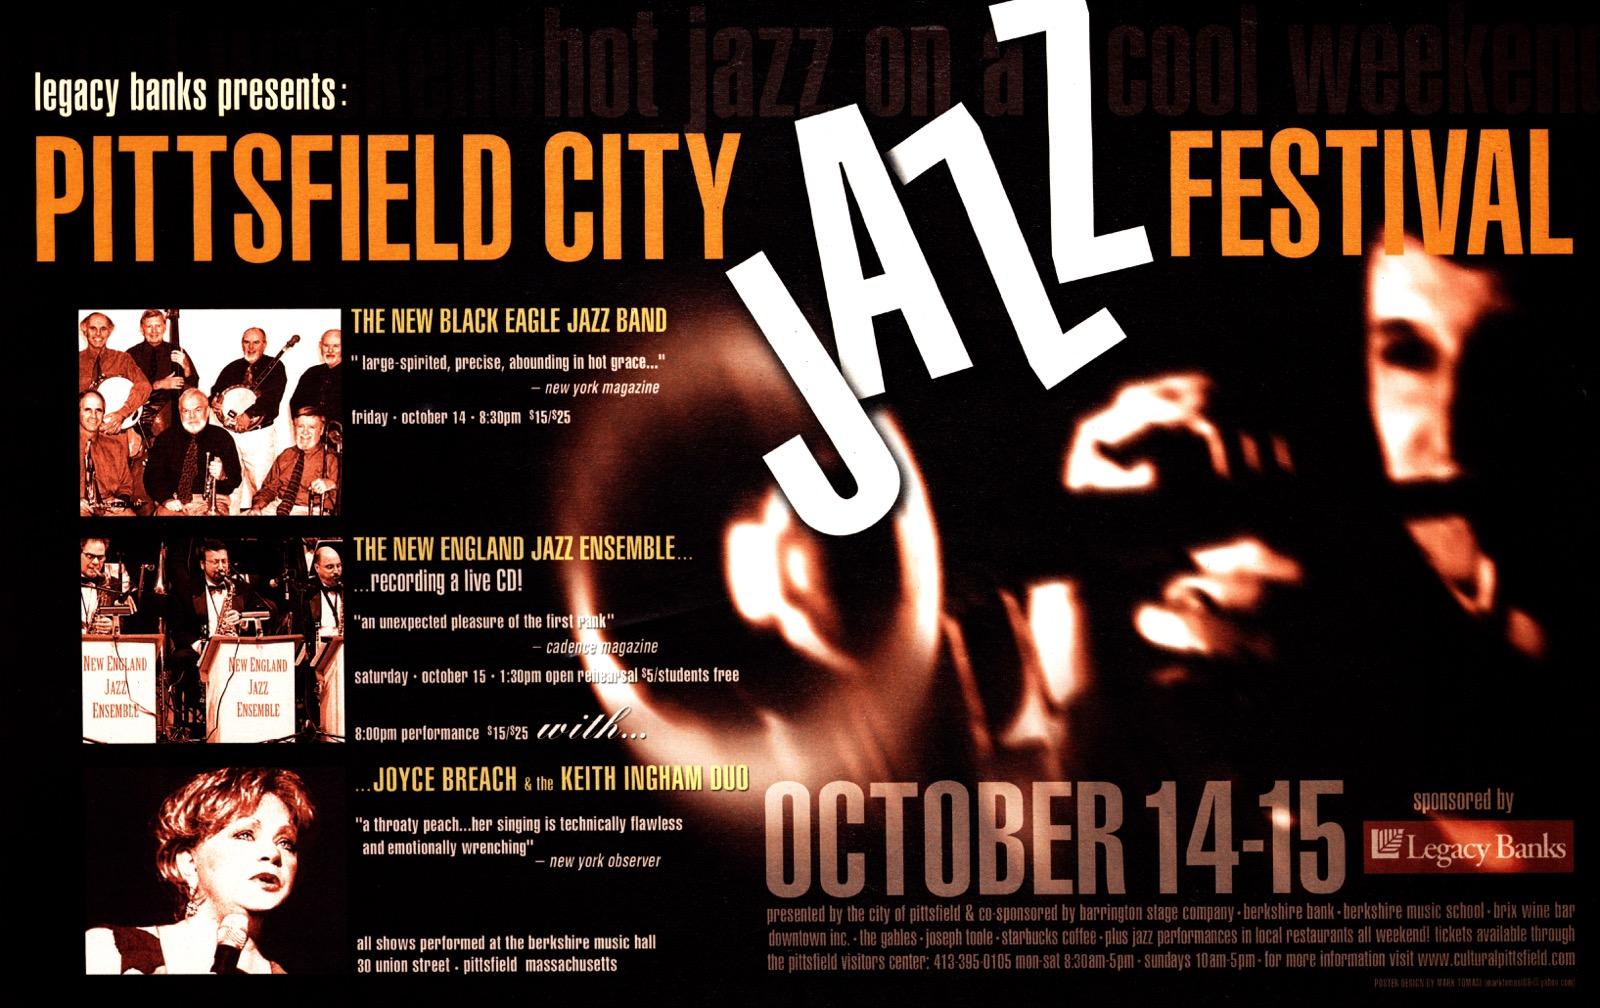 Pittsfield_City_Jazz_Fest_Oct14-15.jpg